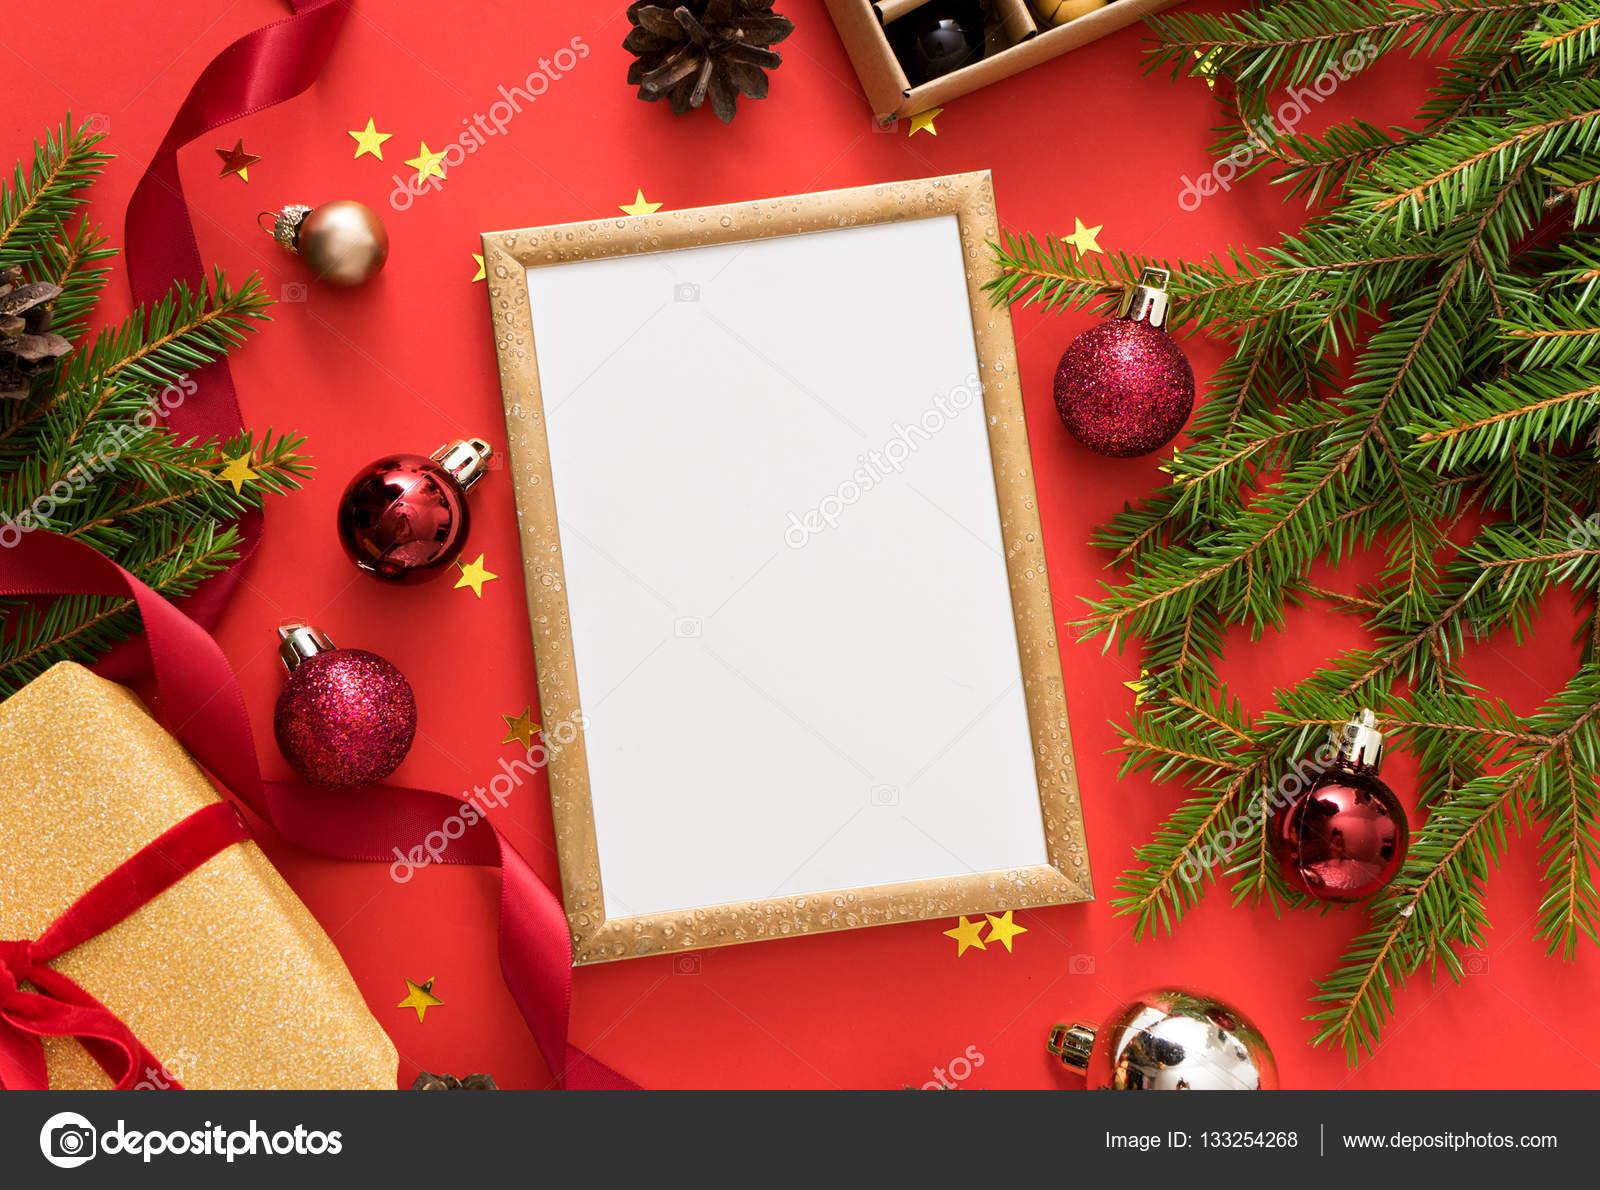 Kerstdecoraties Met Rood : Kerstdecoratie op rode tabel u2014 stockfoto © christina pauchi #133254268